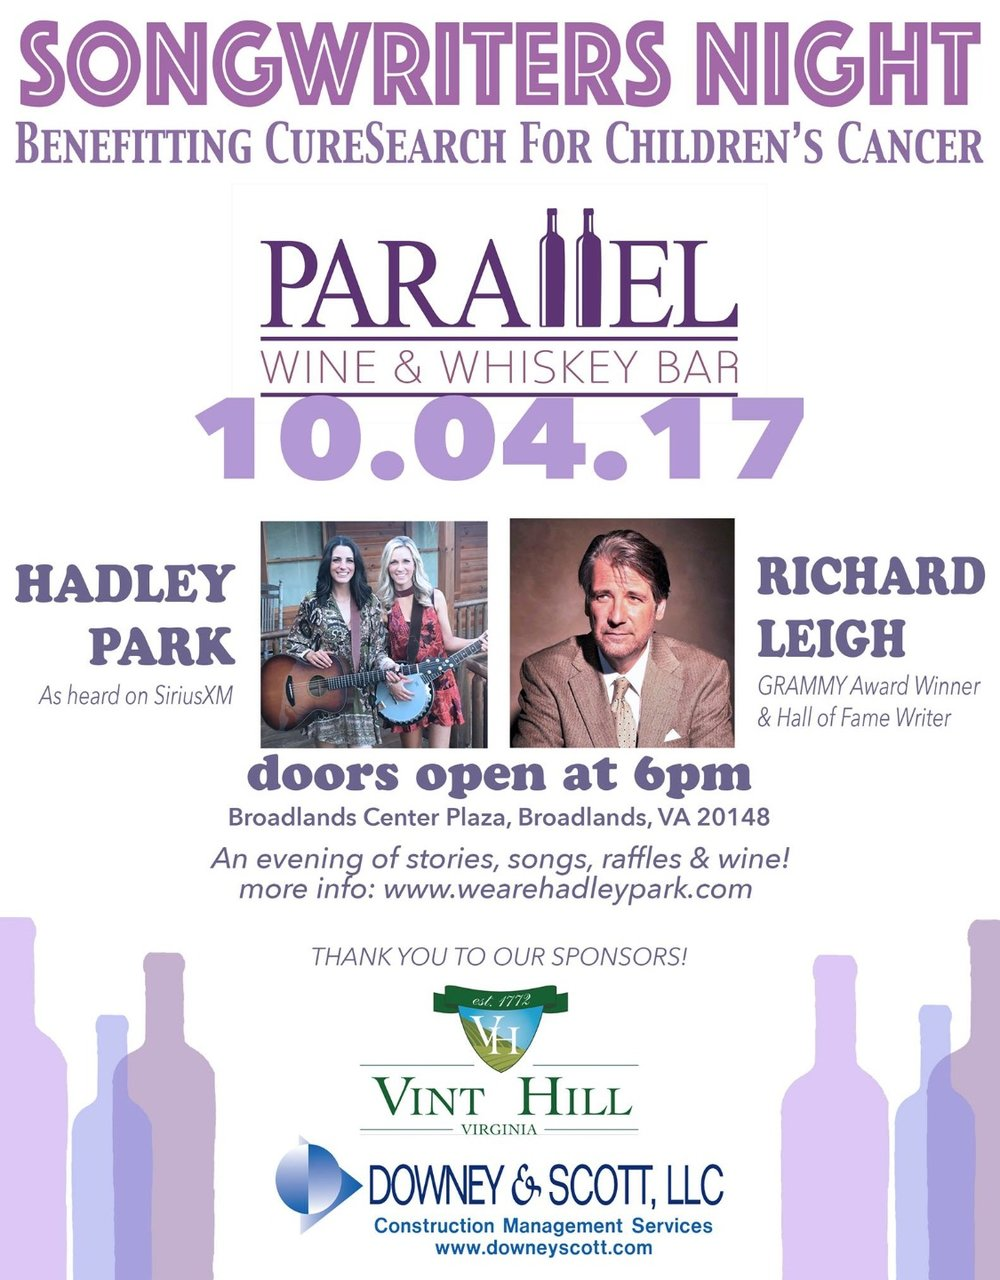 Hadley Park Event.JPG